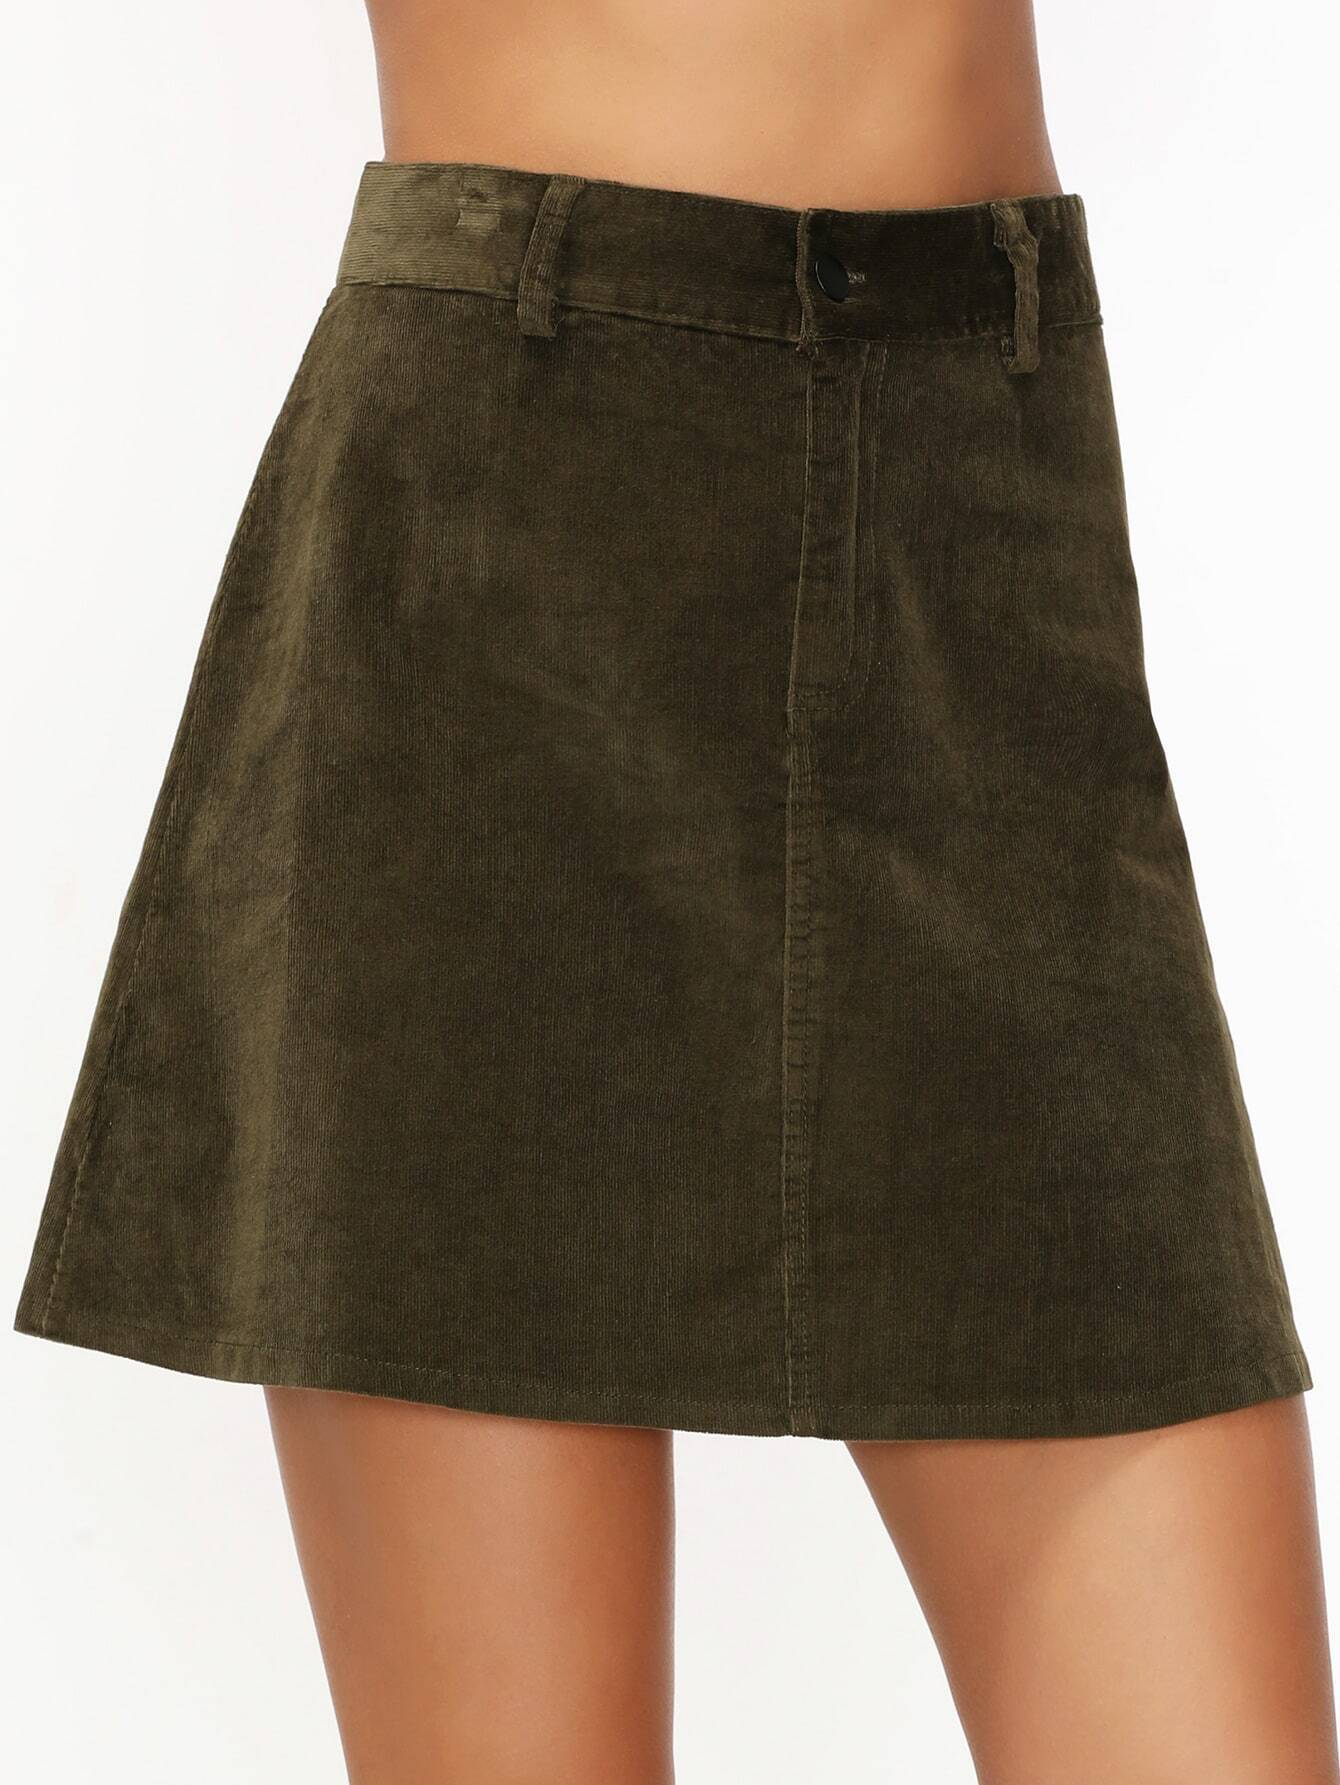 army green corduroy pockets a line skirt